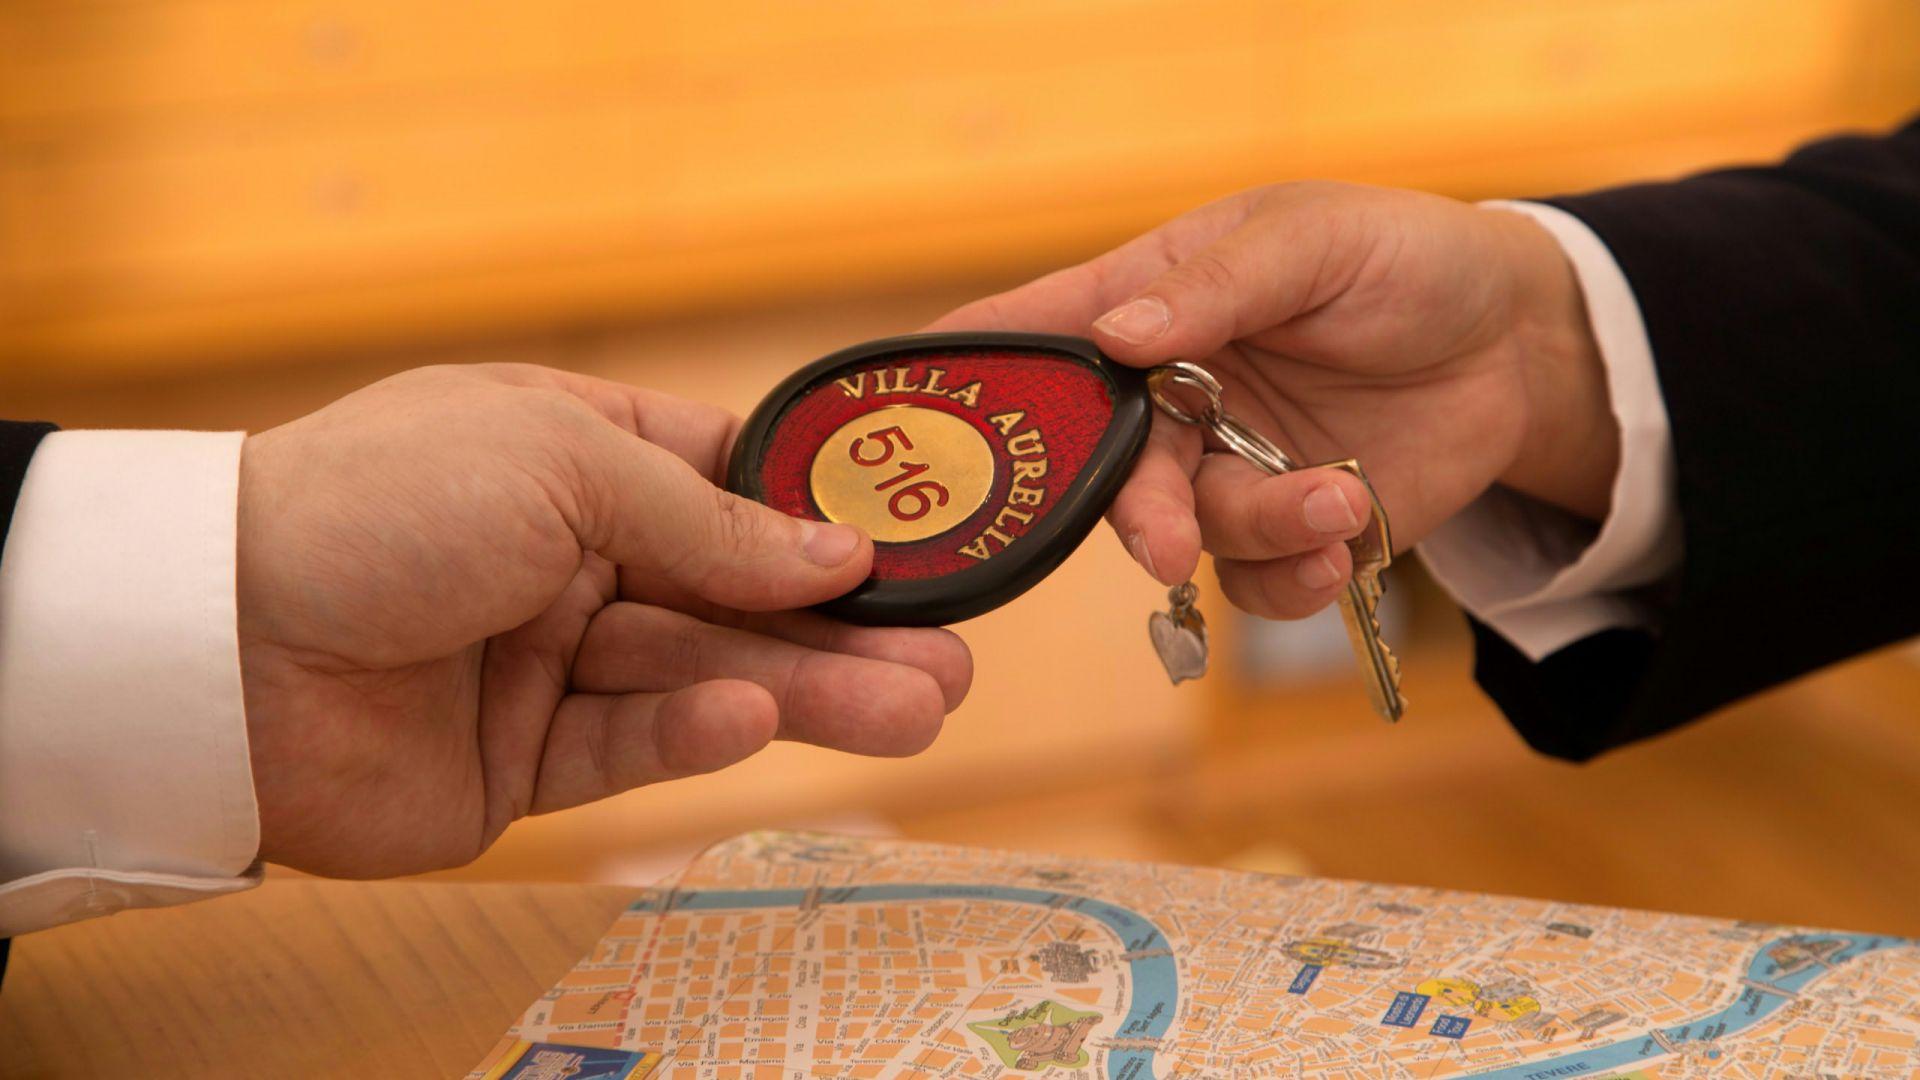 villa-aurelia-hotel-rome-keys-01